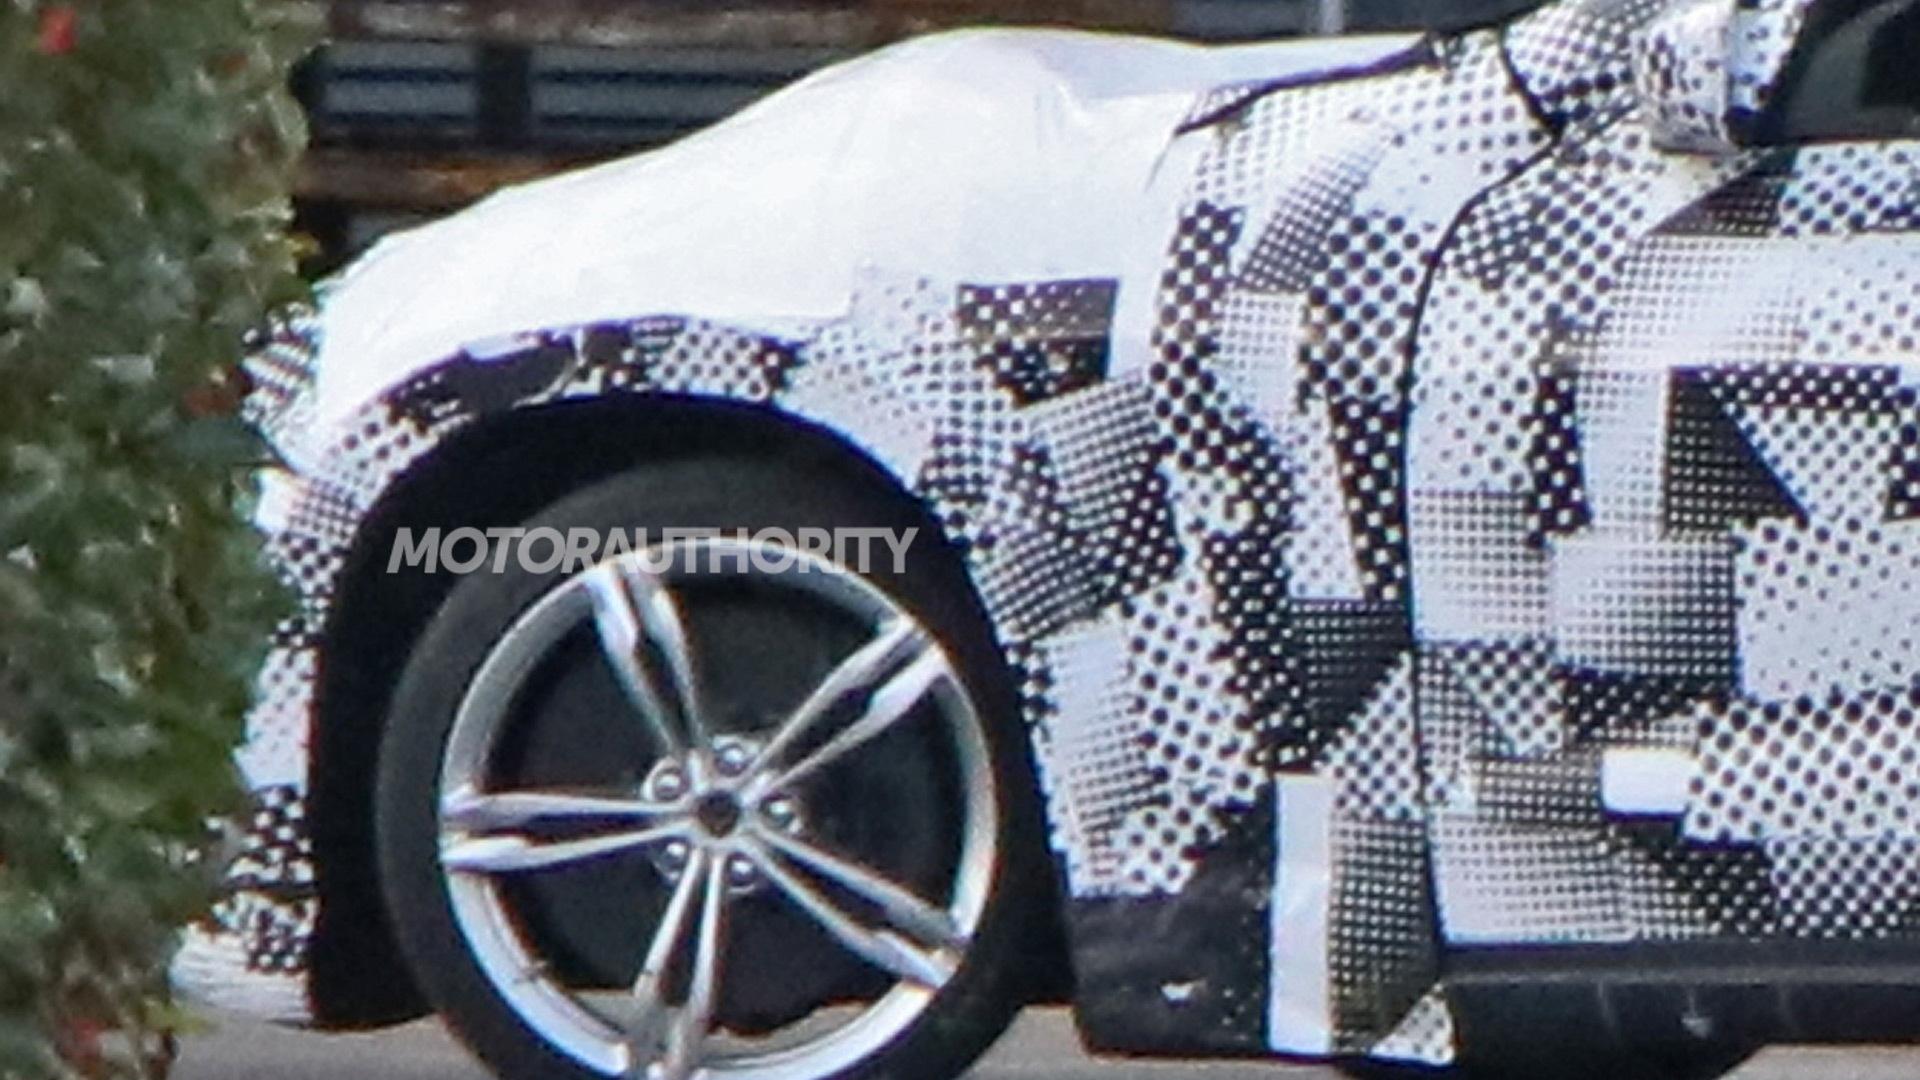 2022 Ferrari Purosangue test mule spy shots - Photo credit:S. Baldauf/SB-Medien